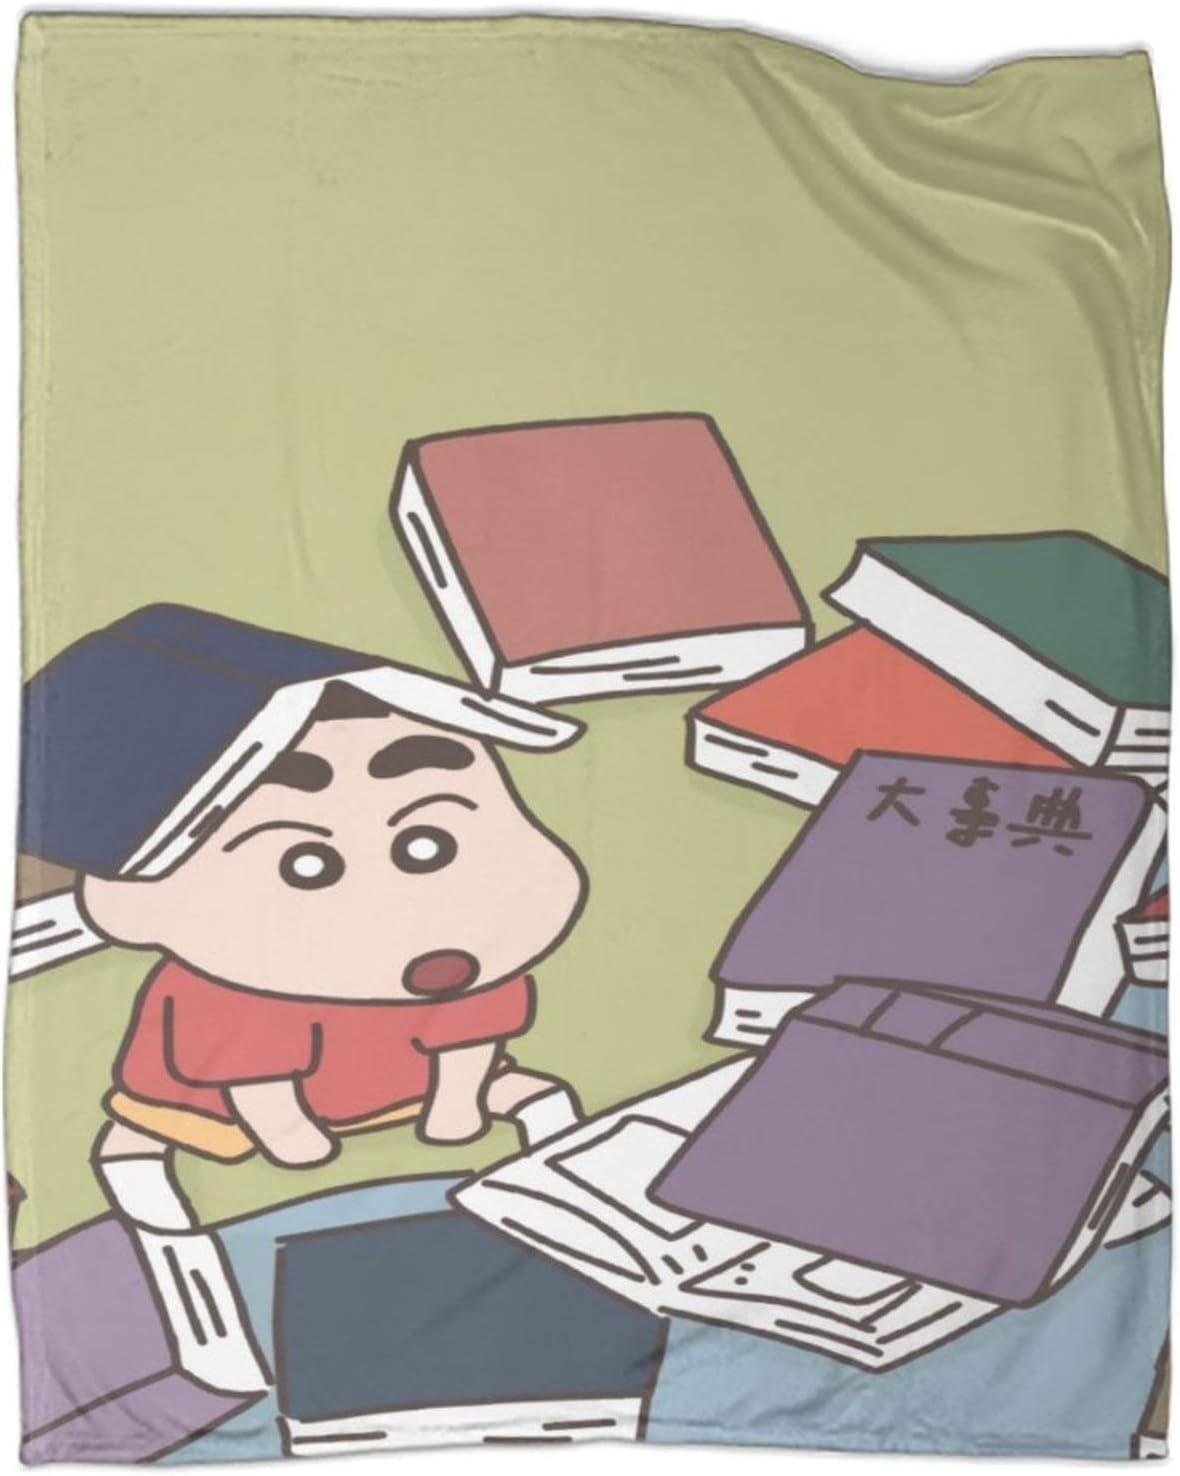 Crayon Shin-chan Shinchan'Dog Shiro Cartoon Comics Bedroom Warm Blanket Warm Home Bed Sofa 60x80inch(150x200cm)